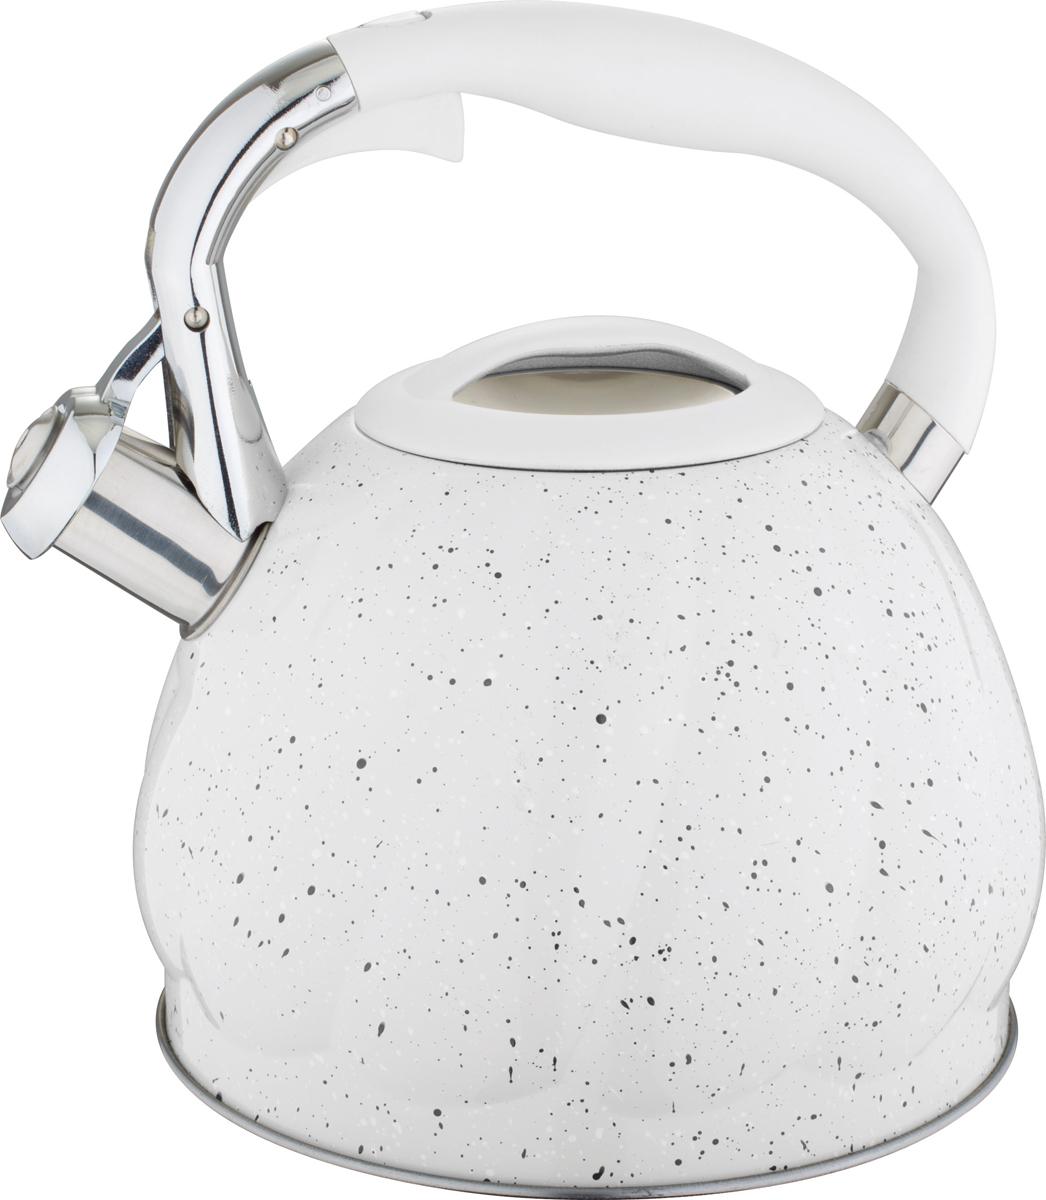 Чайник Rainstahl, со свистком, цвет: белый, 3 л riess чайник со свистком pastell 2 л 0543 015 rosa riess